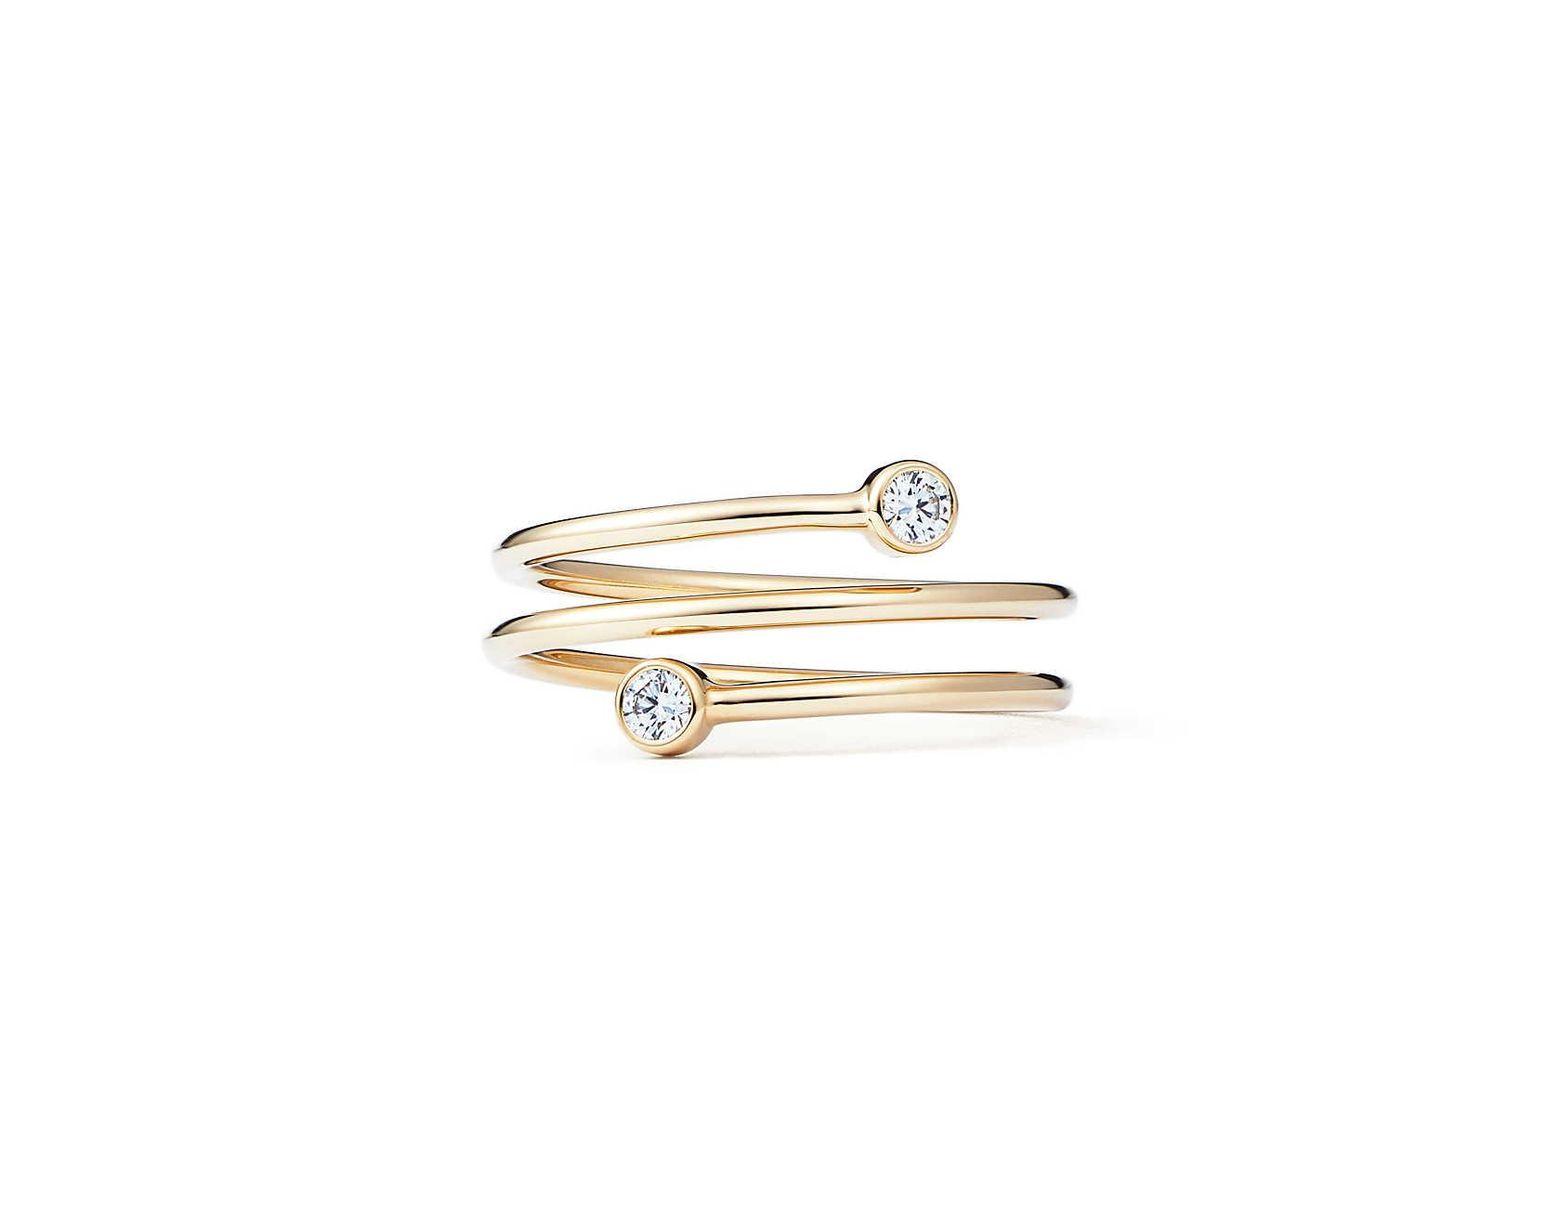 06d3bfe6e Tiffany & Co. Elsa Peretti® Diamond Hoop Three-row Ring In 18k Gold With  Diamonds - Size 4 in Metallic - Lyst